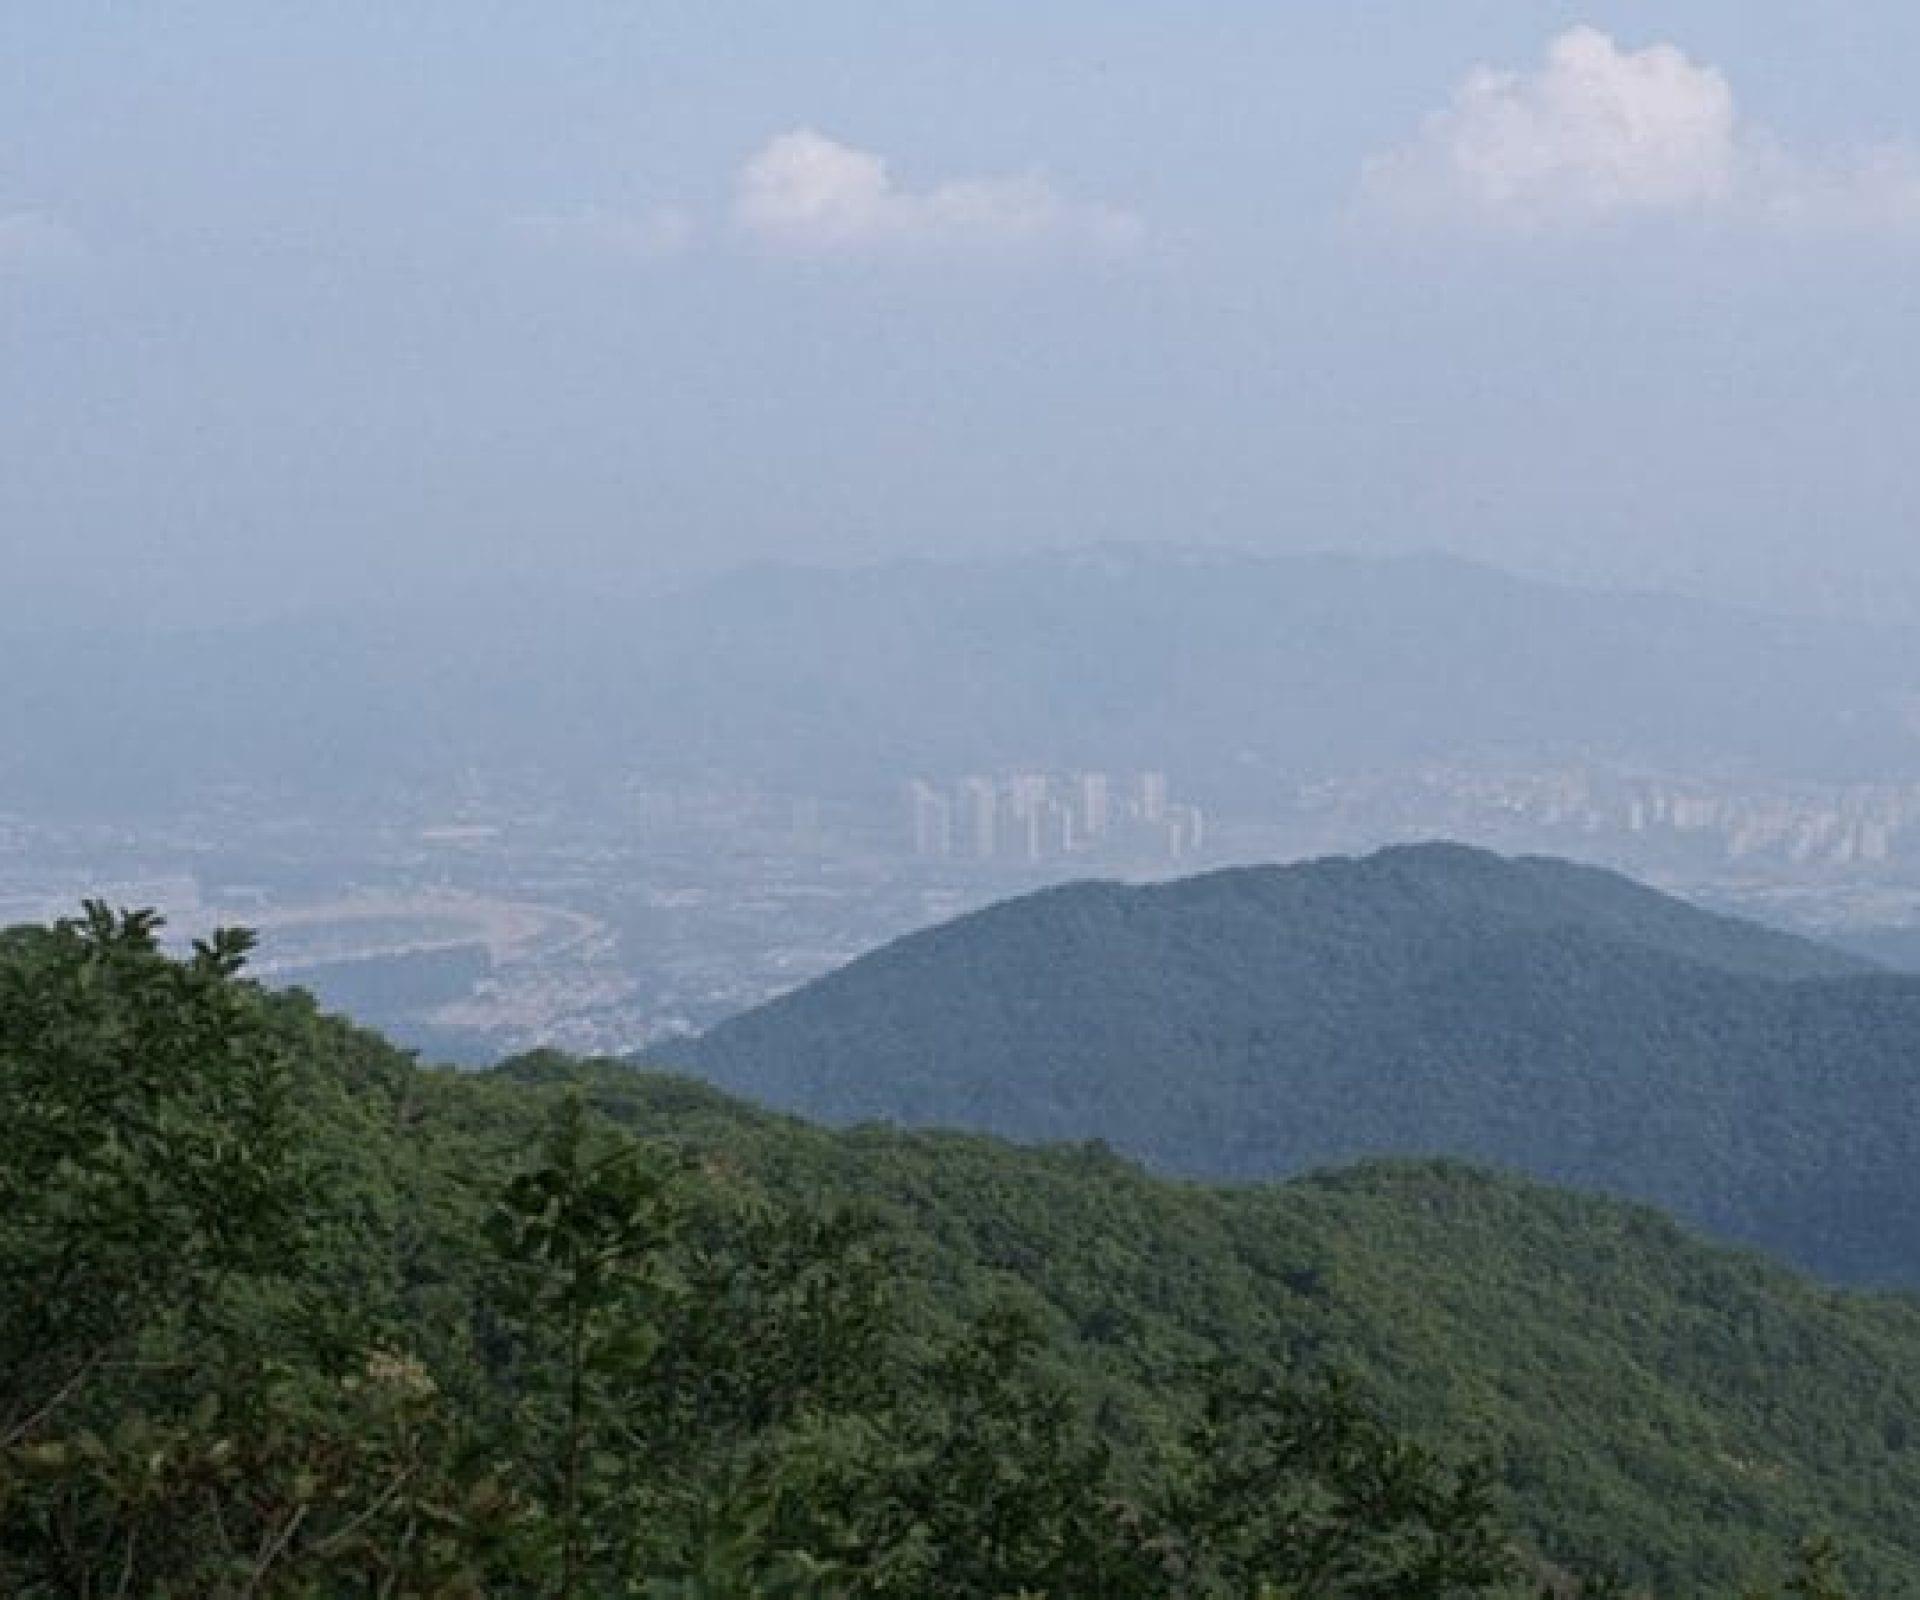 Cheonggyesan Mountain | Seocho-gu, Seoul